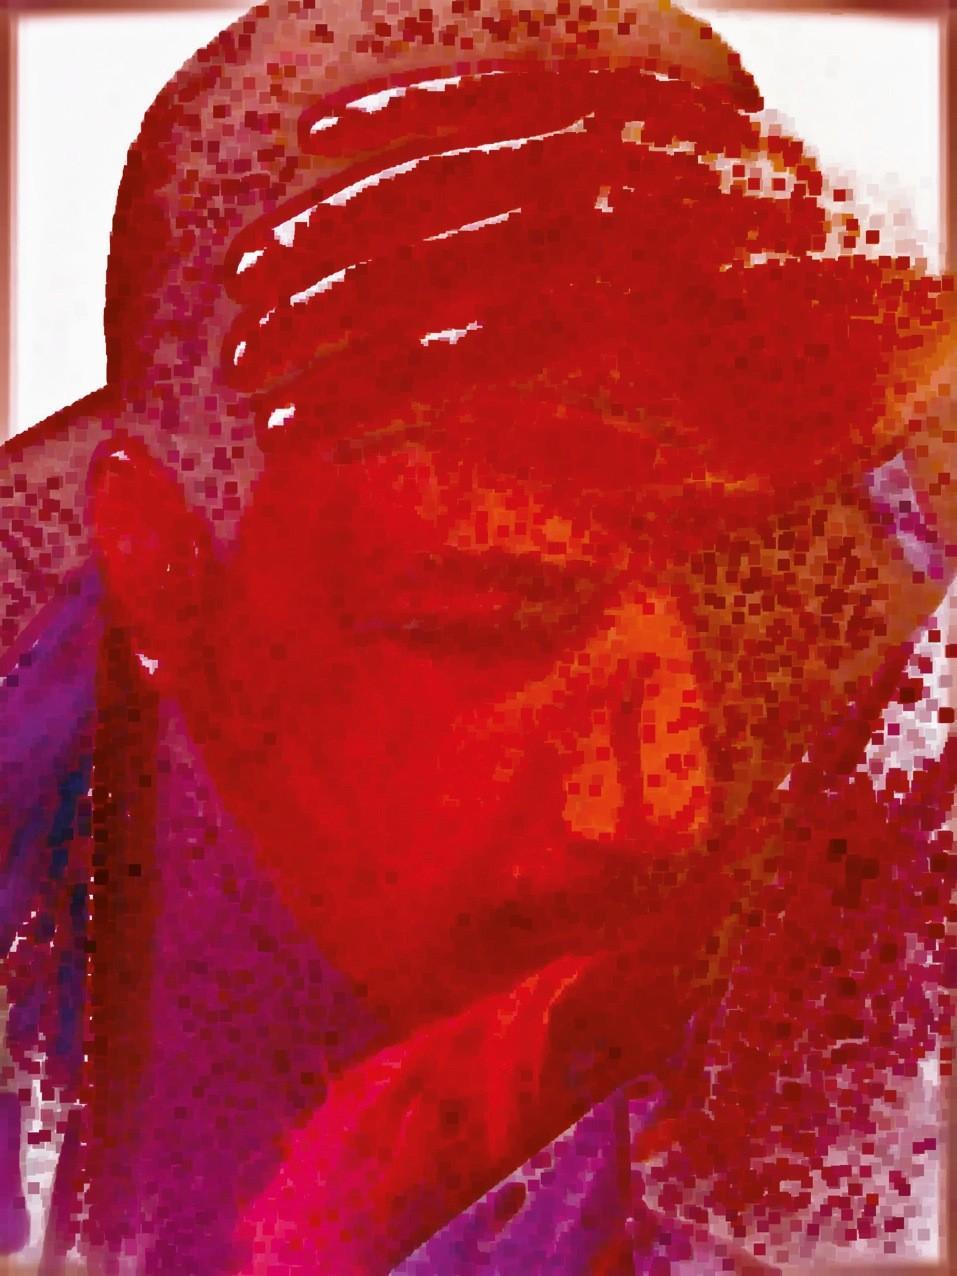 LEON FONTANA - Bloody Spring - BAD LIFE - mixed media (c) ArtForum Editions